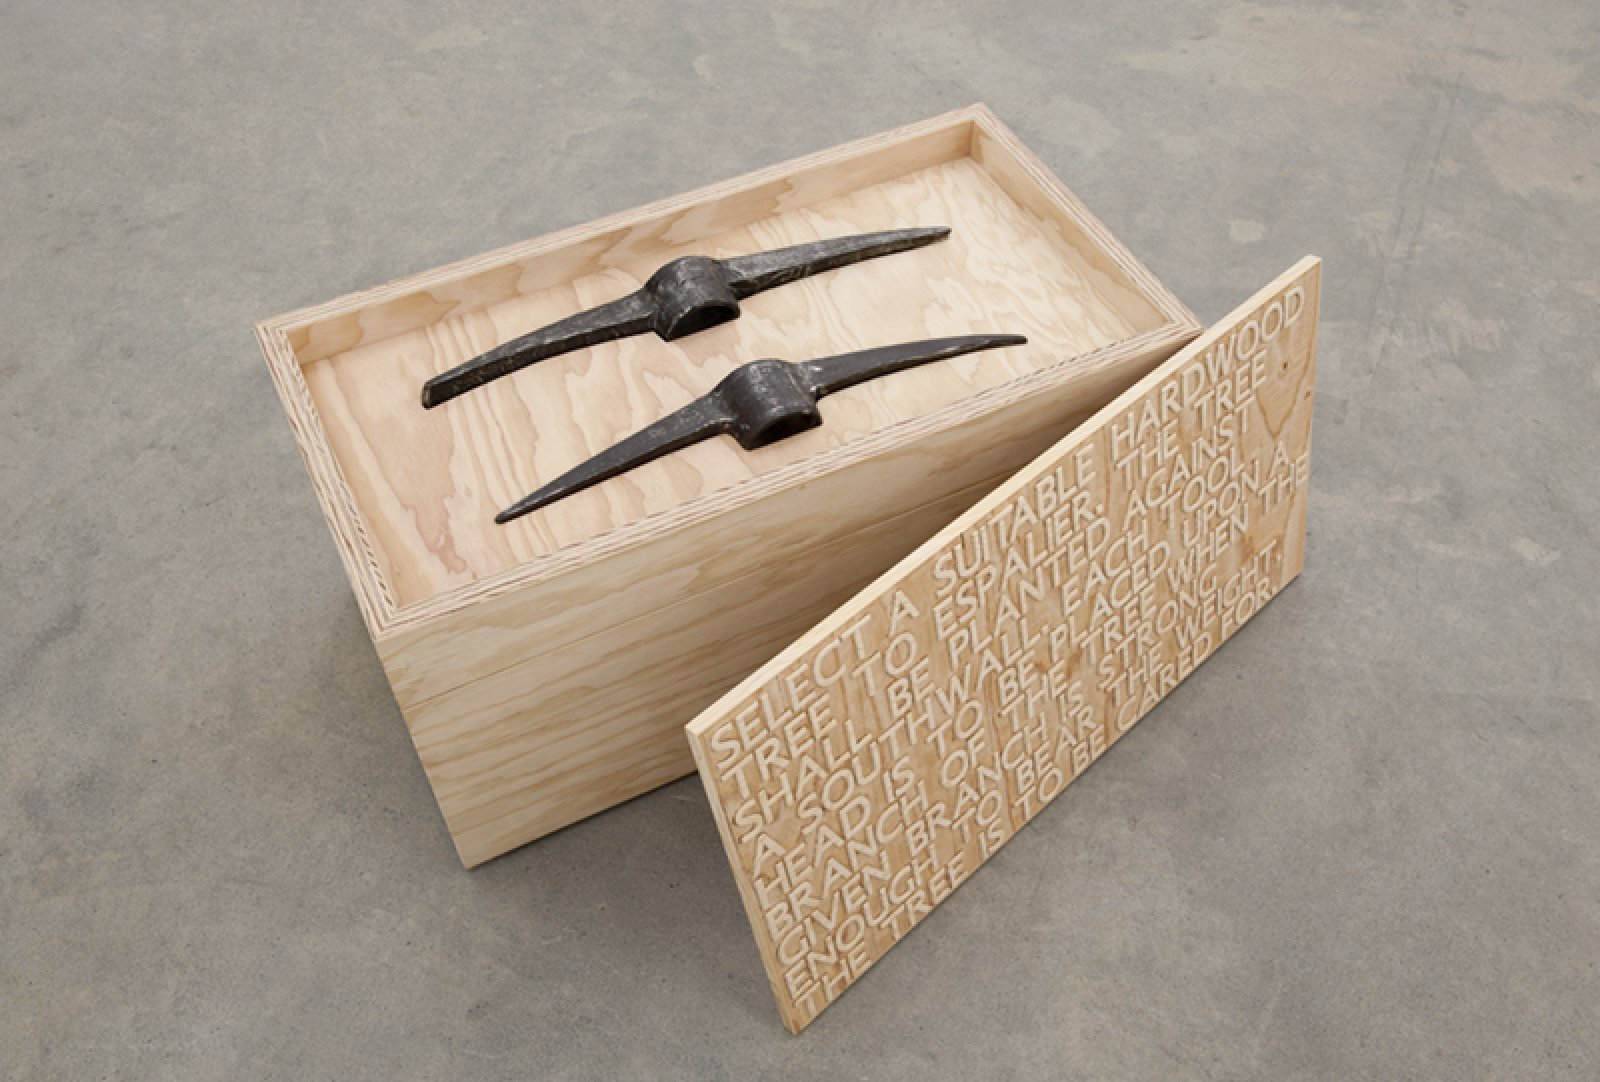 Brian Jungen,Bushido, 2012,fir plywood, axe heads, tree, book,16 x 31 x 16 in. (41 x 79 x 41 cm)